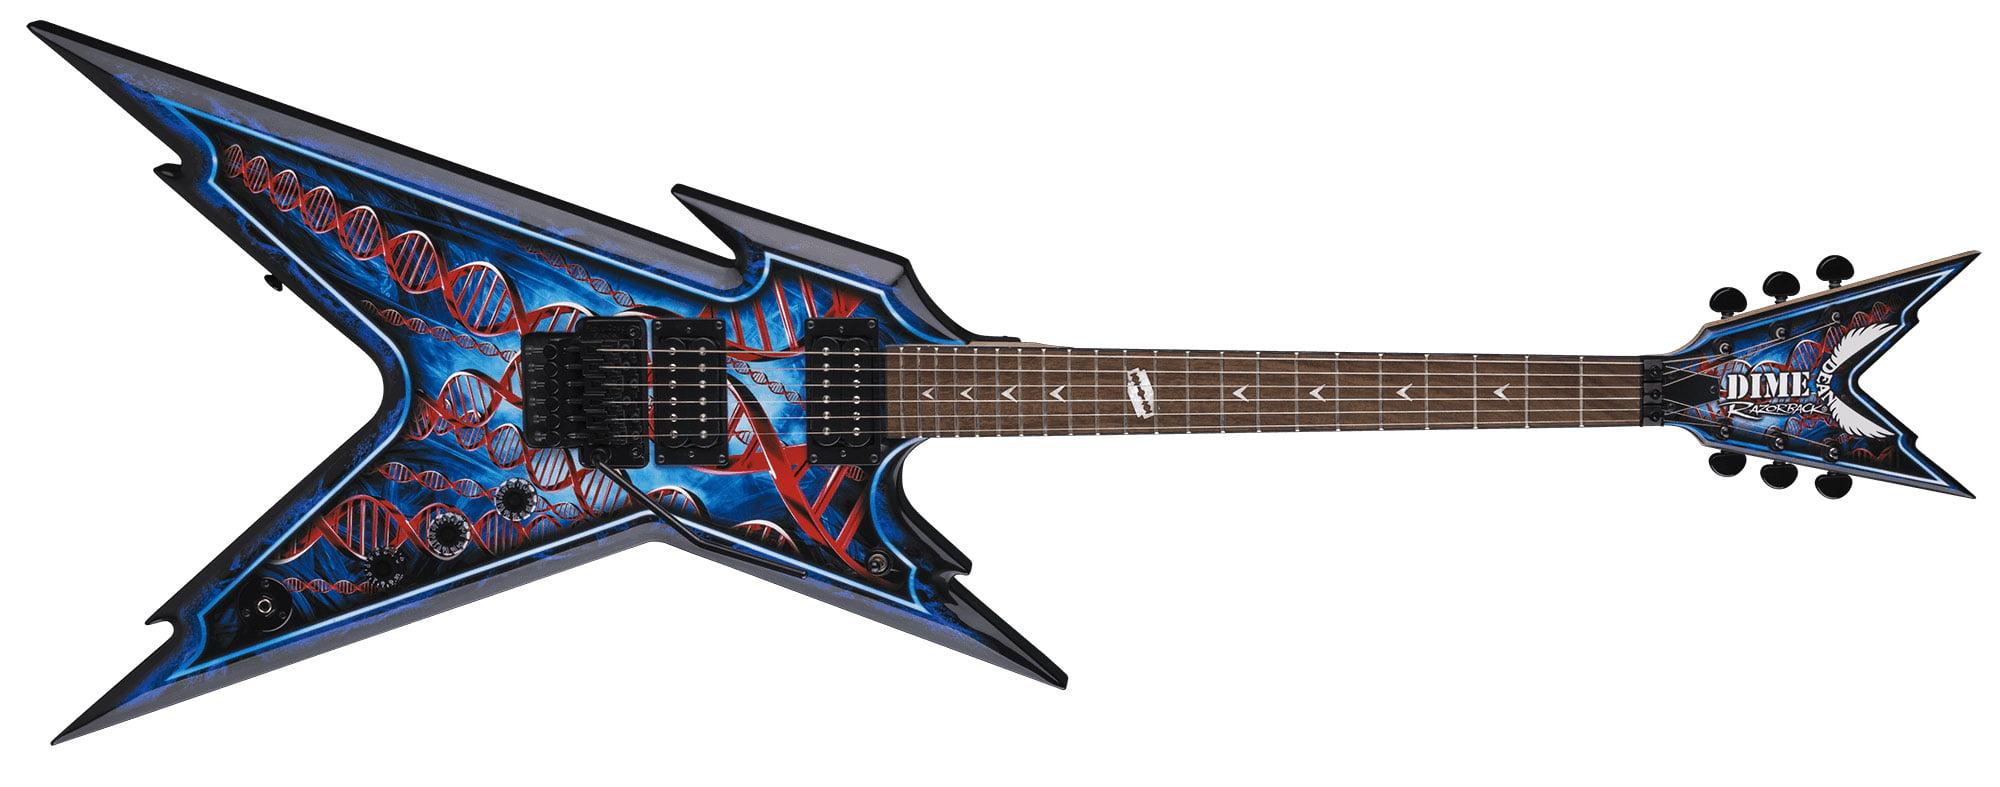 Dean 6 String Dimebag Razorback Floyd Electric Guitar & Case DNA Splatter Grapic by